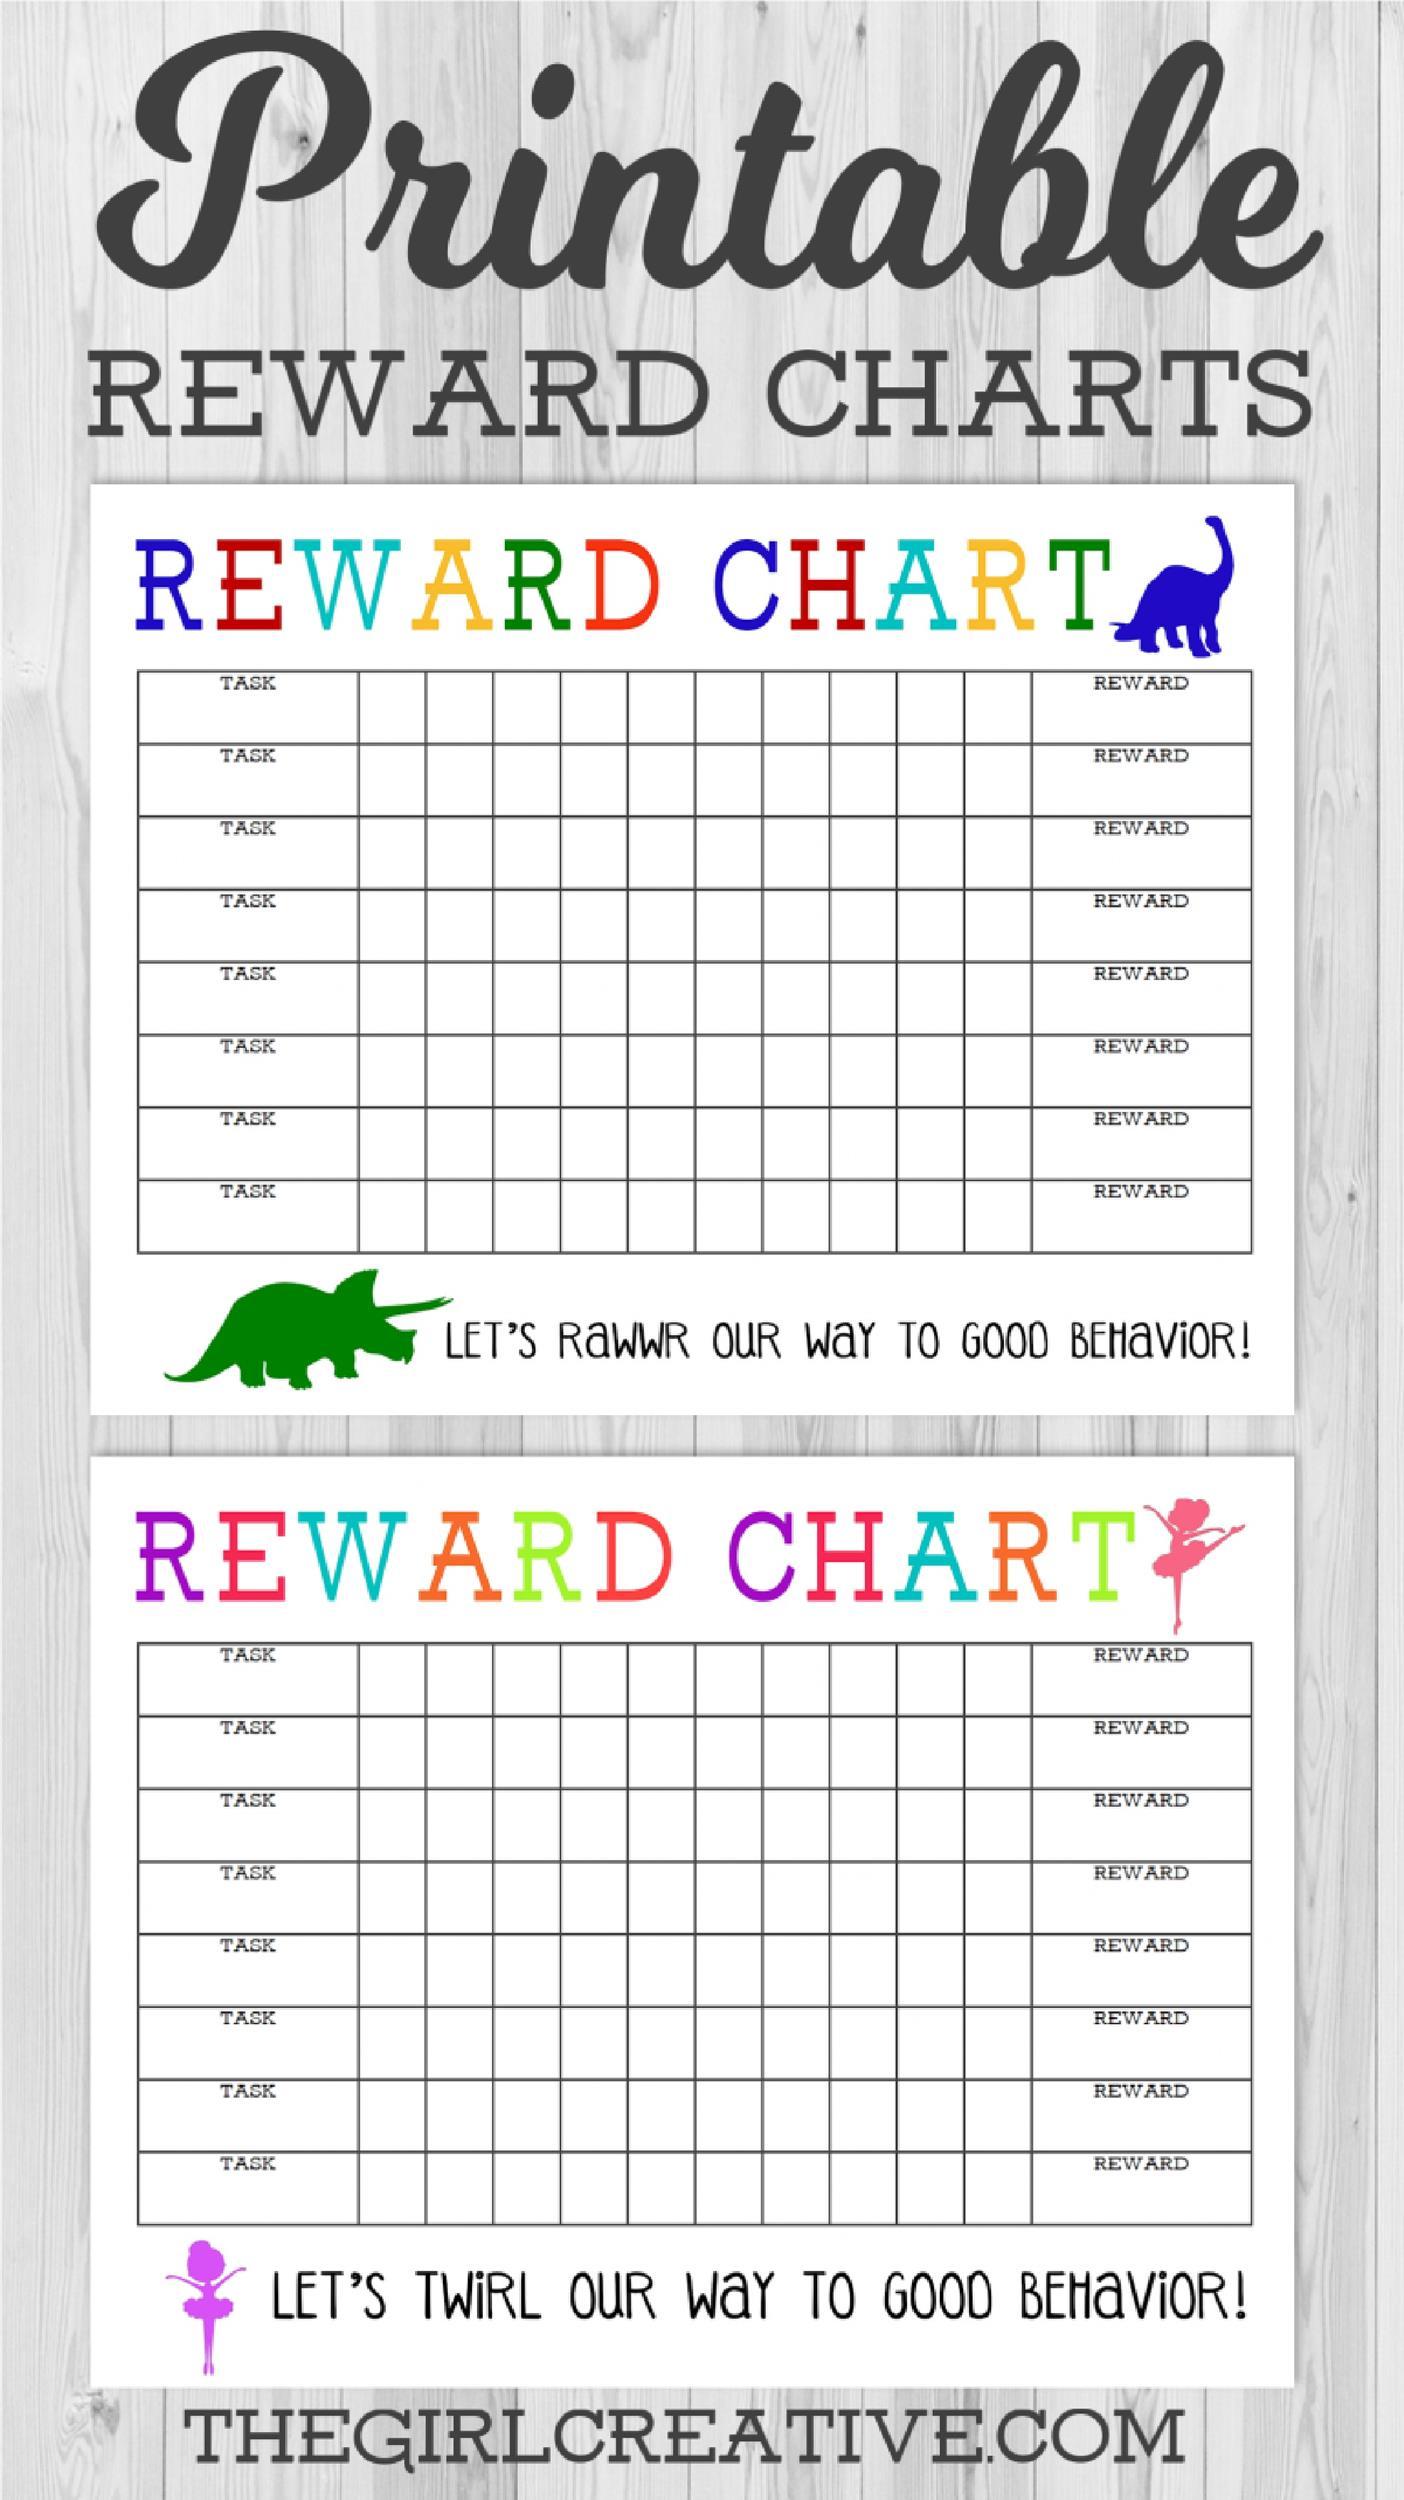 40 Printable Reward Charts for Kids (PDF, Excel & Word)